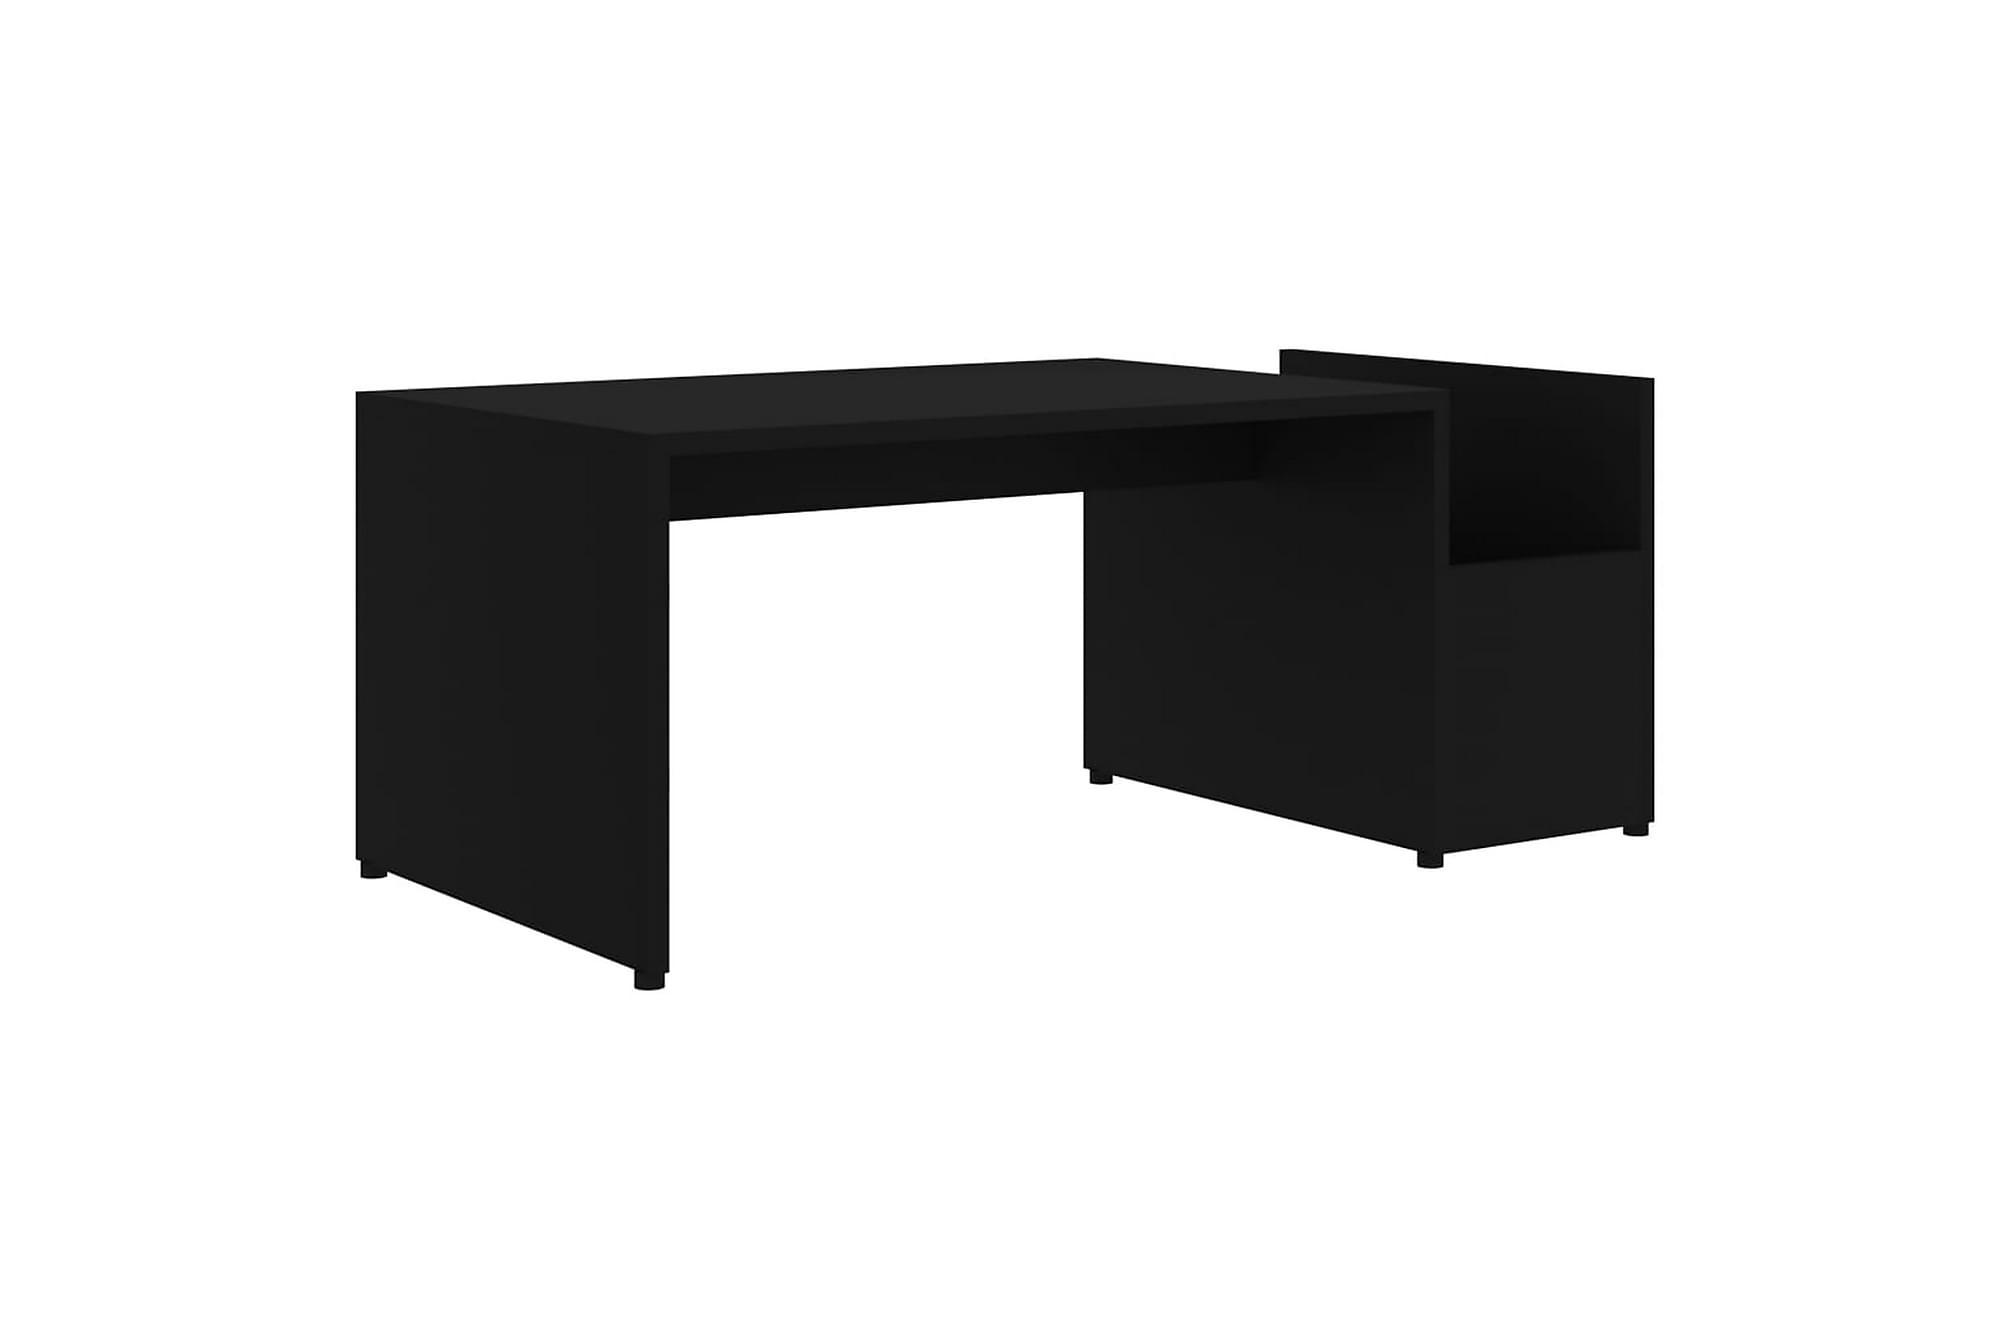 Soffbord svart 90x45x35 cm spånskiva